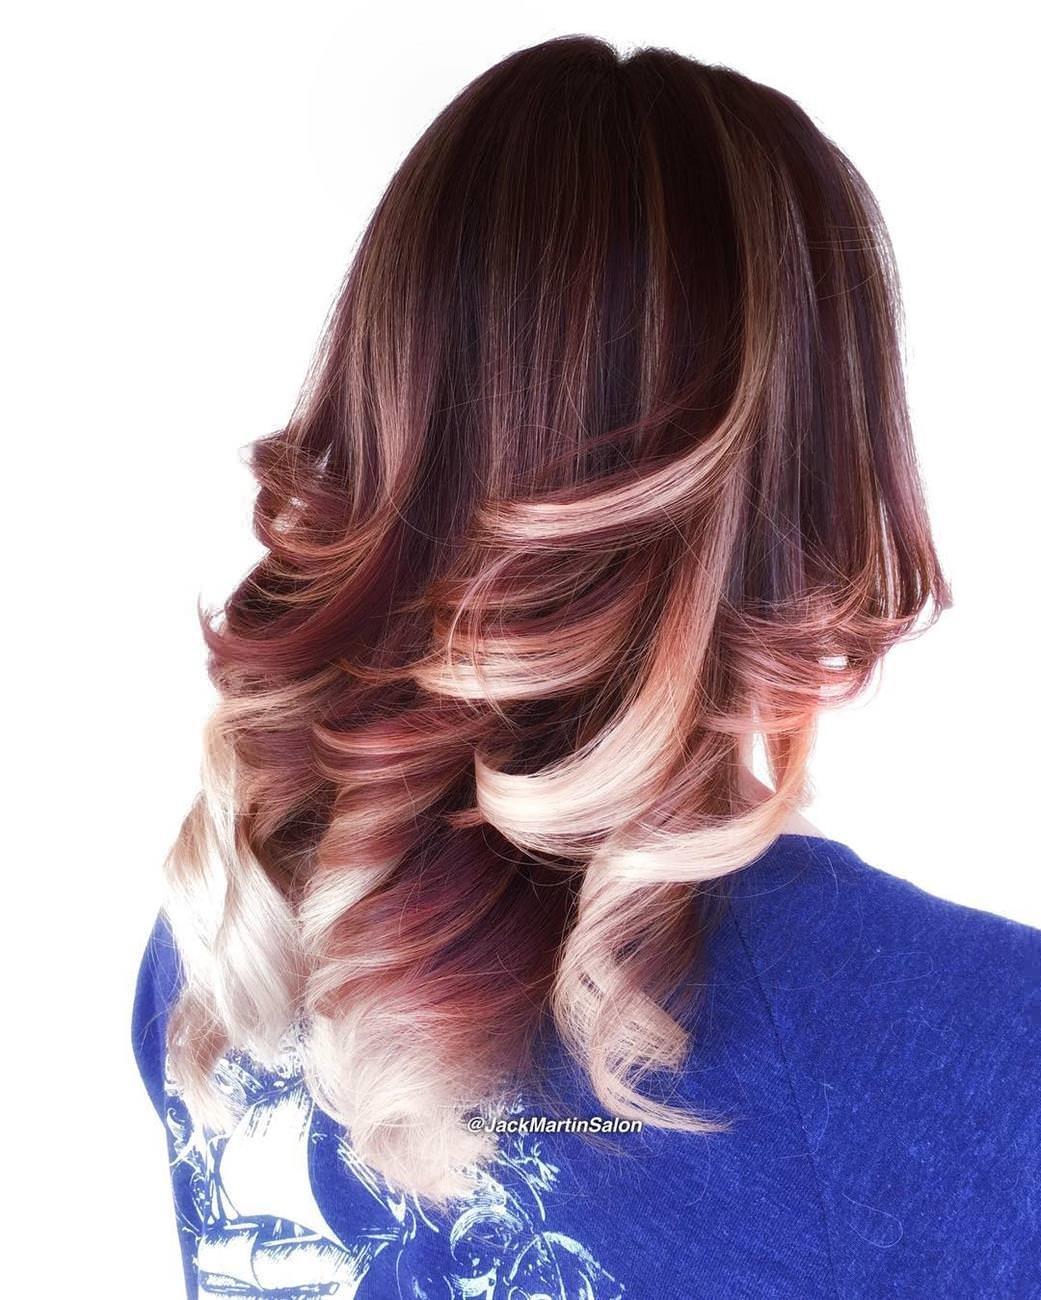 окрас волос омбре на средние волосы фото сажали без суда